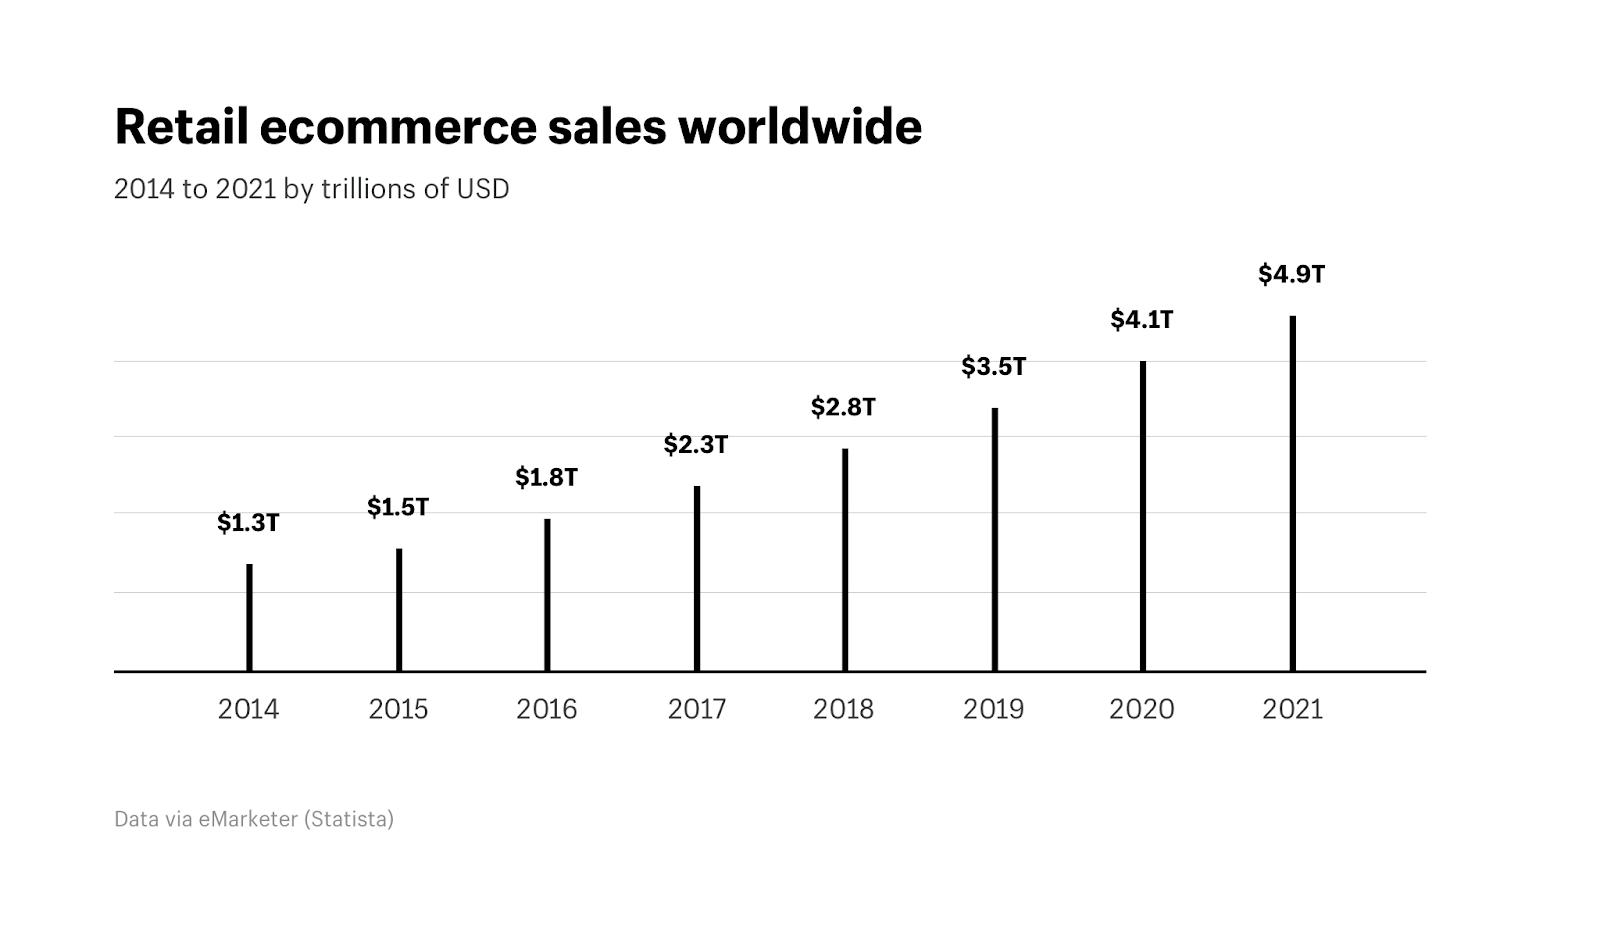 Retail_ecommerce_sales_worldwide (1)